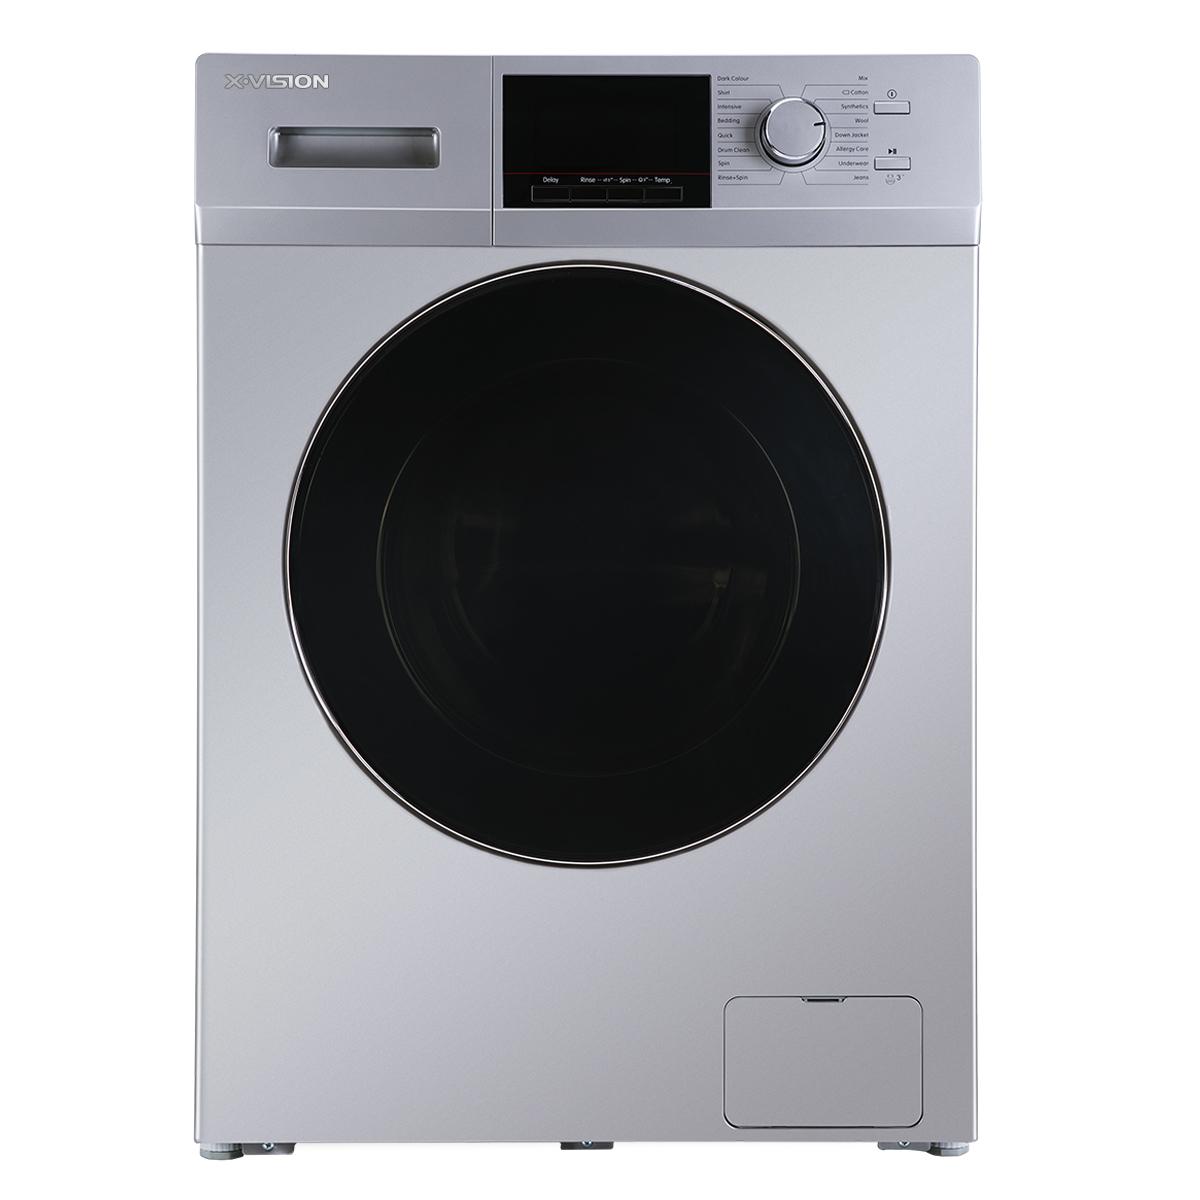 ماشین لباسشویی ایکس ویژن مدل XTW-904BI ظرفیت 9 کیلوگرم